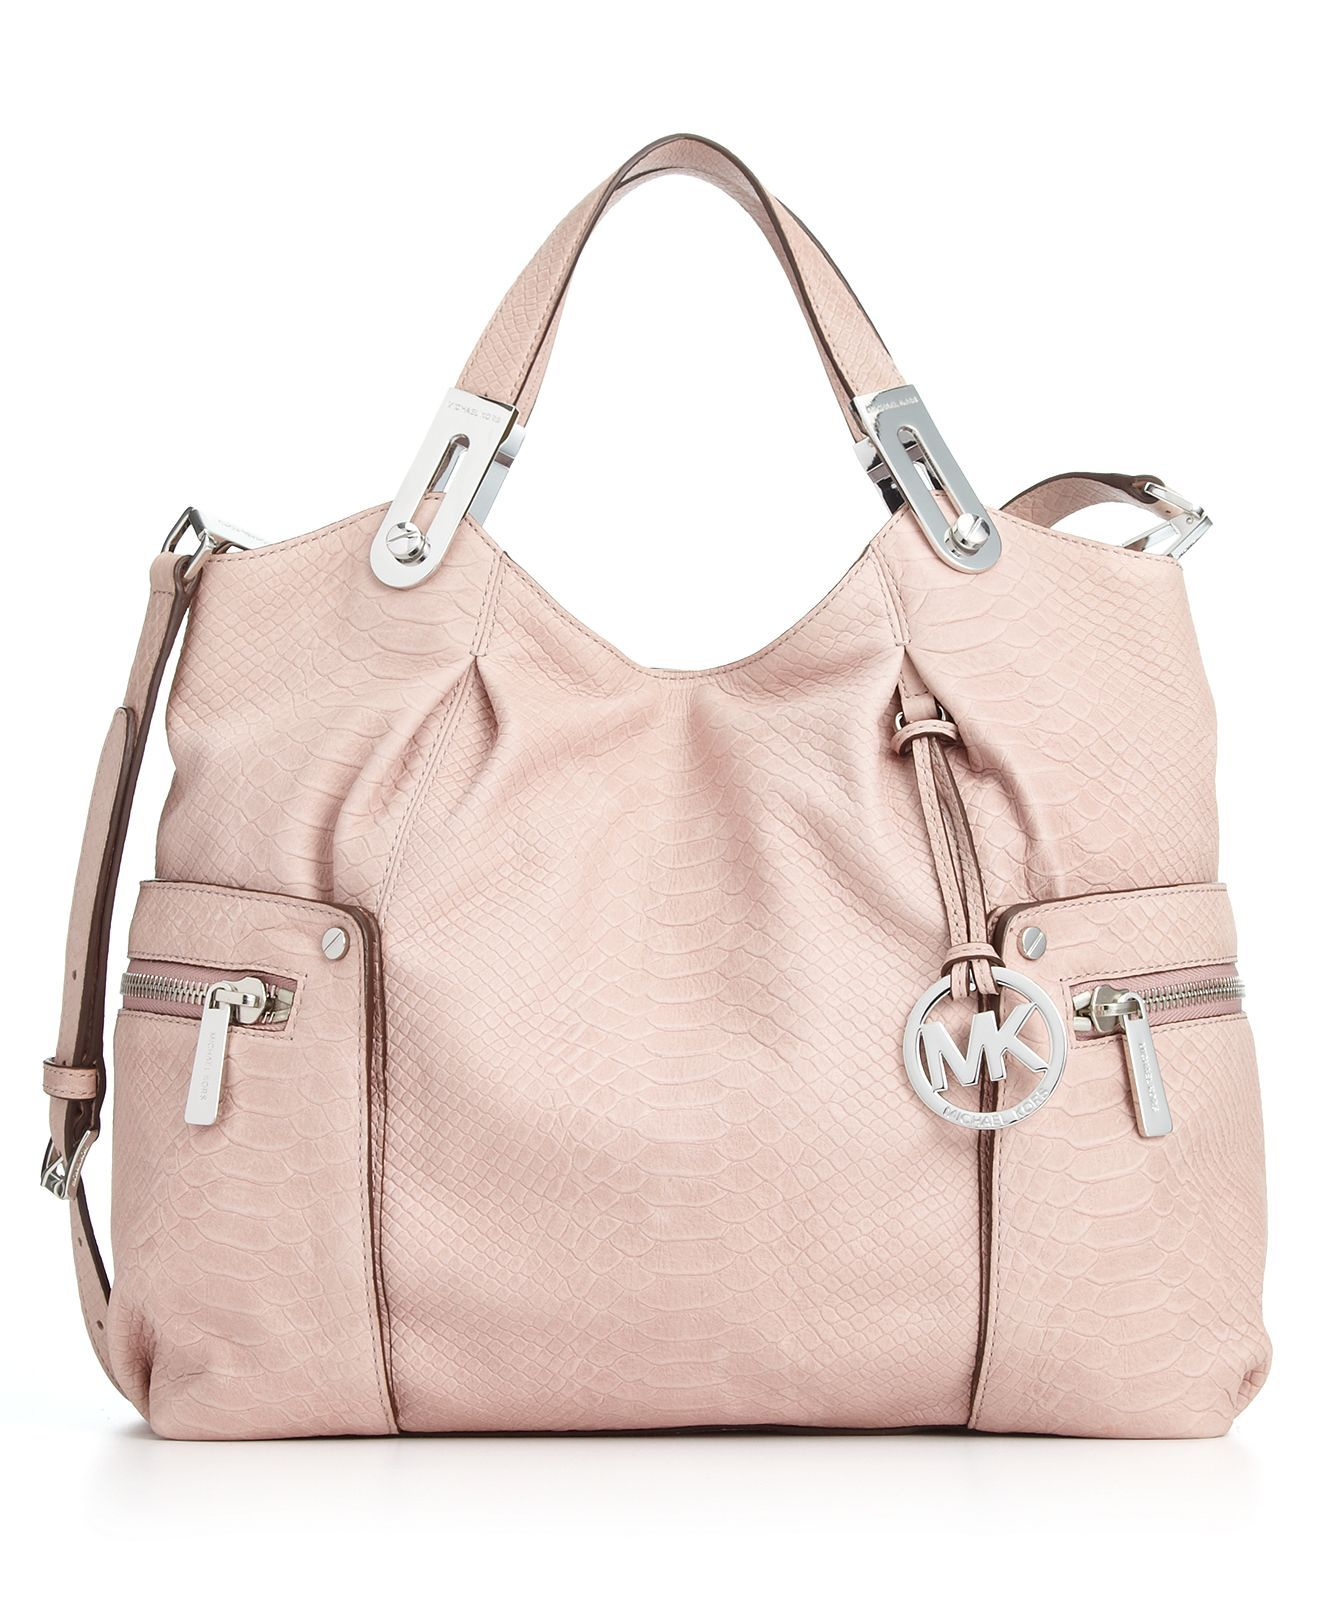 58cd487dd58502 $478.00 @macy's MICHAEL Michael Kors Handbag, Brookton East West .